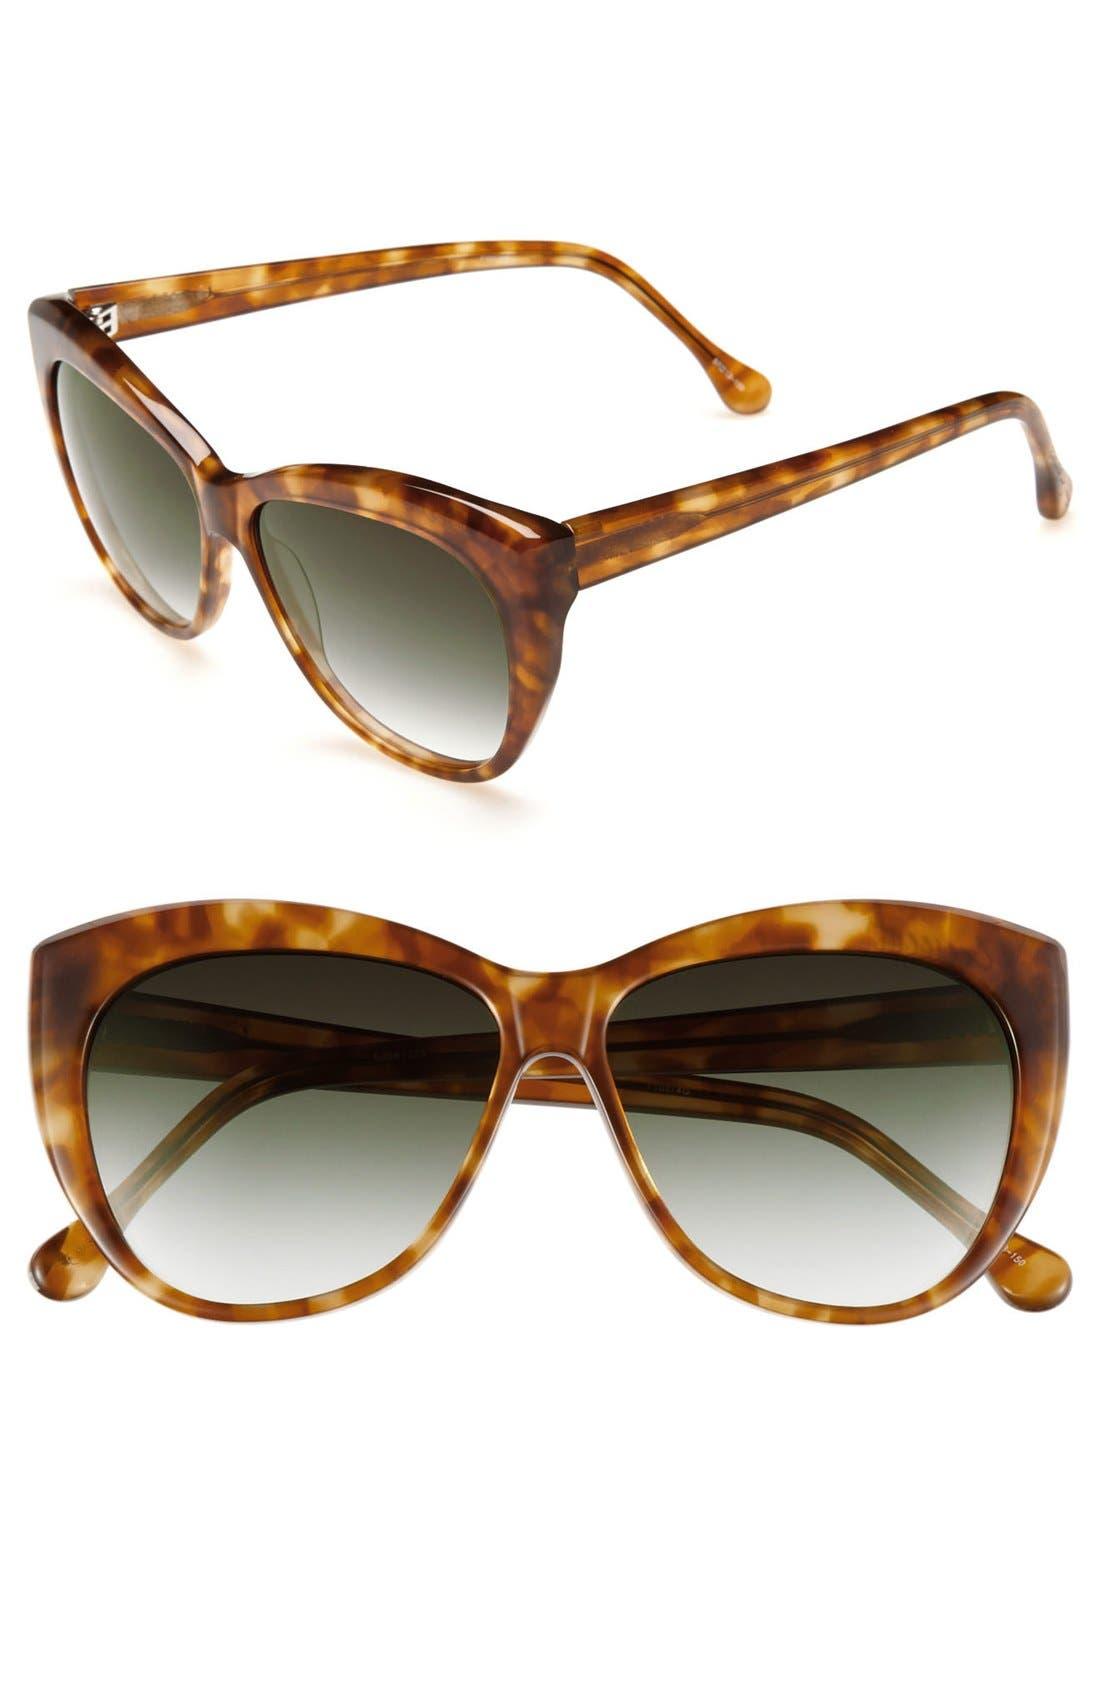 Main Image - Elizabeth and James 'Crescent' 57mm Sunglasses